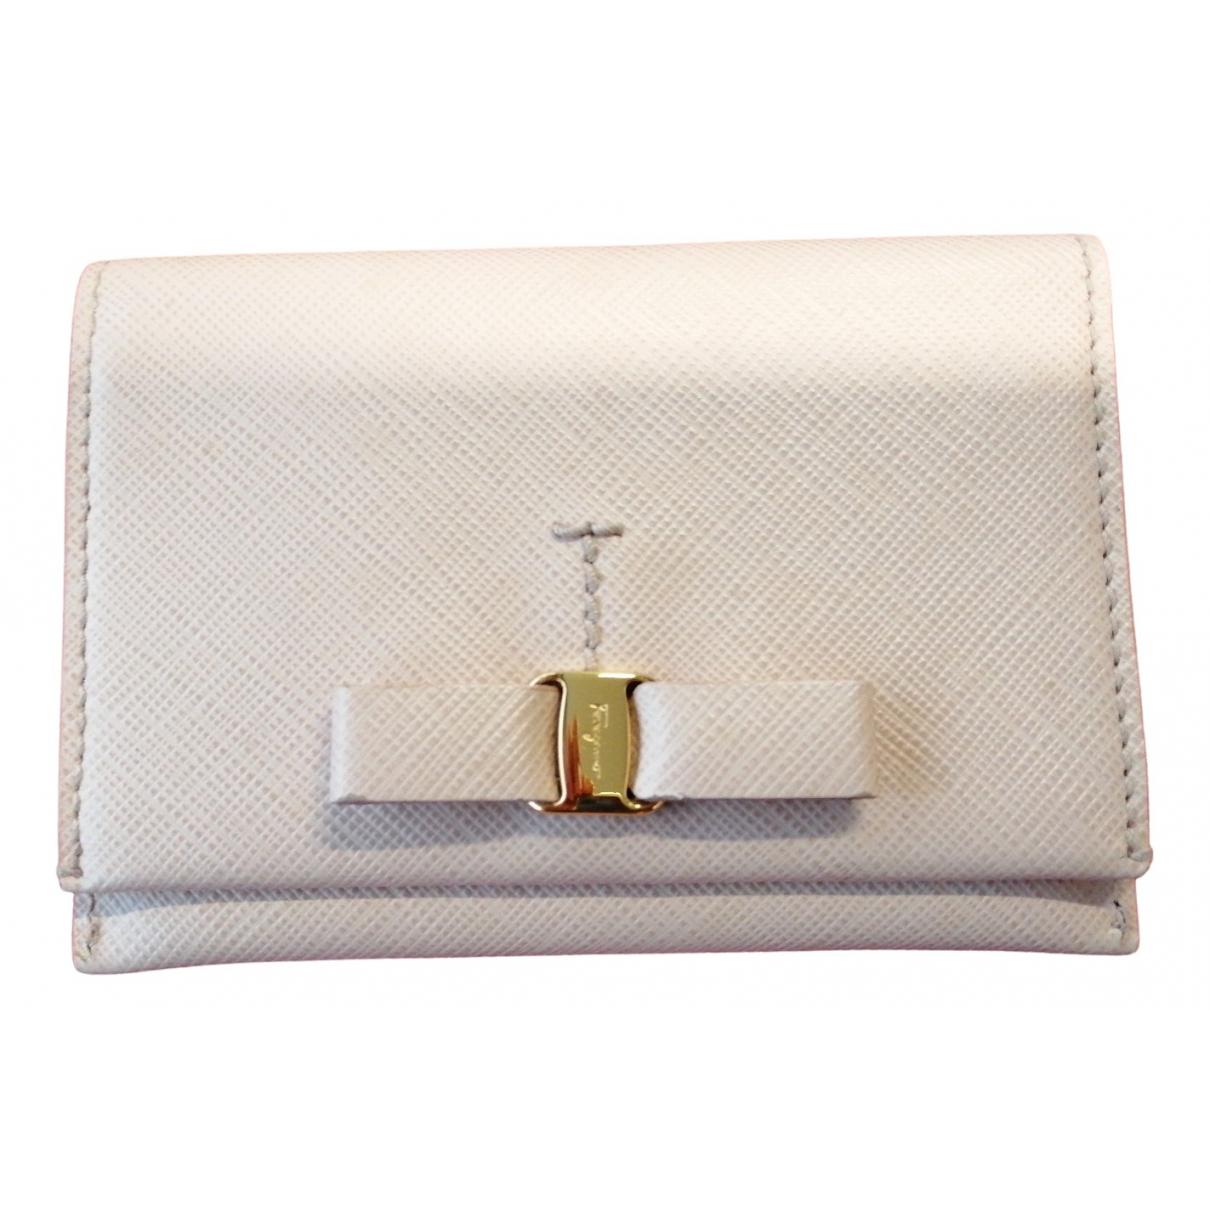 Salvatore Ferragamo \N Pink Leather Purses, wallet & cases for Women \N